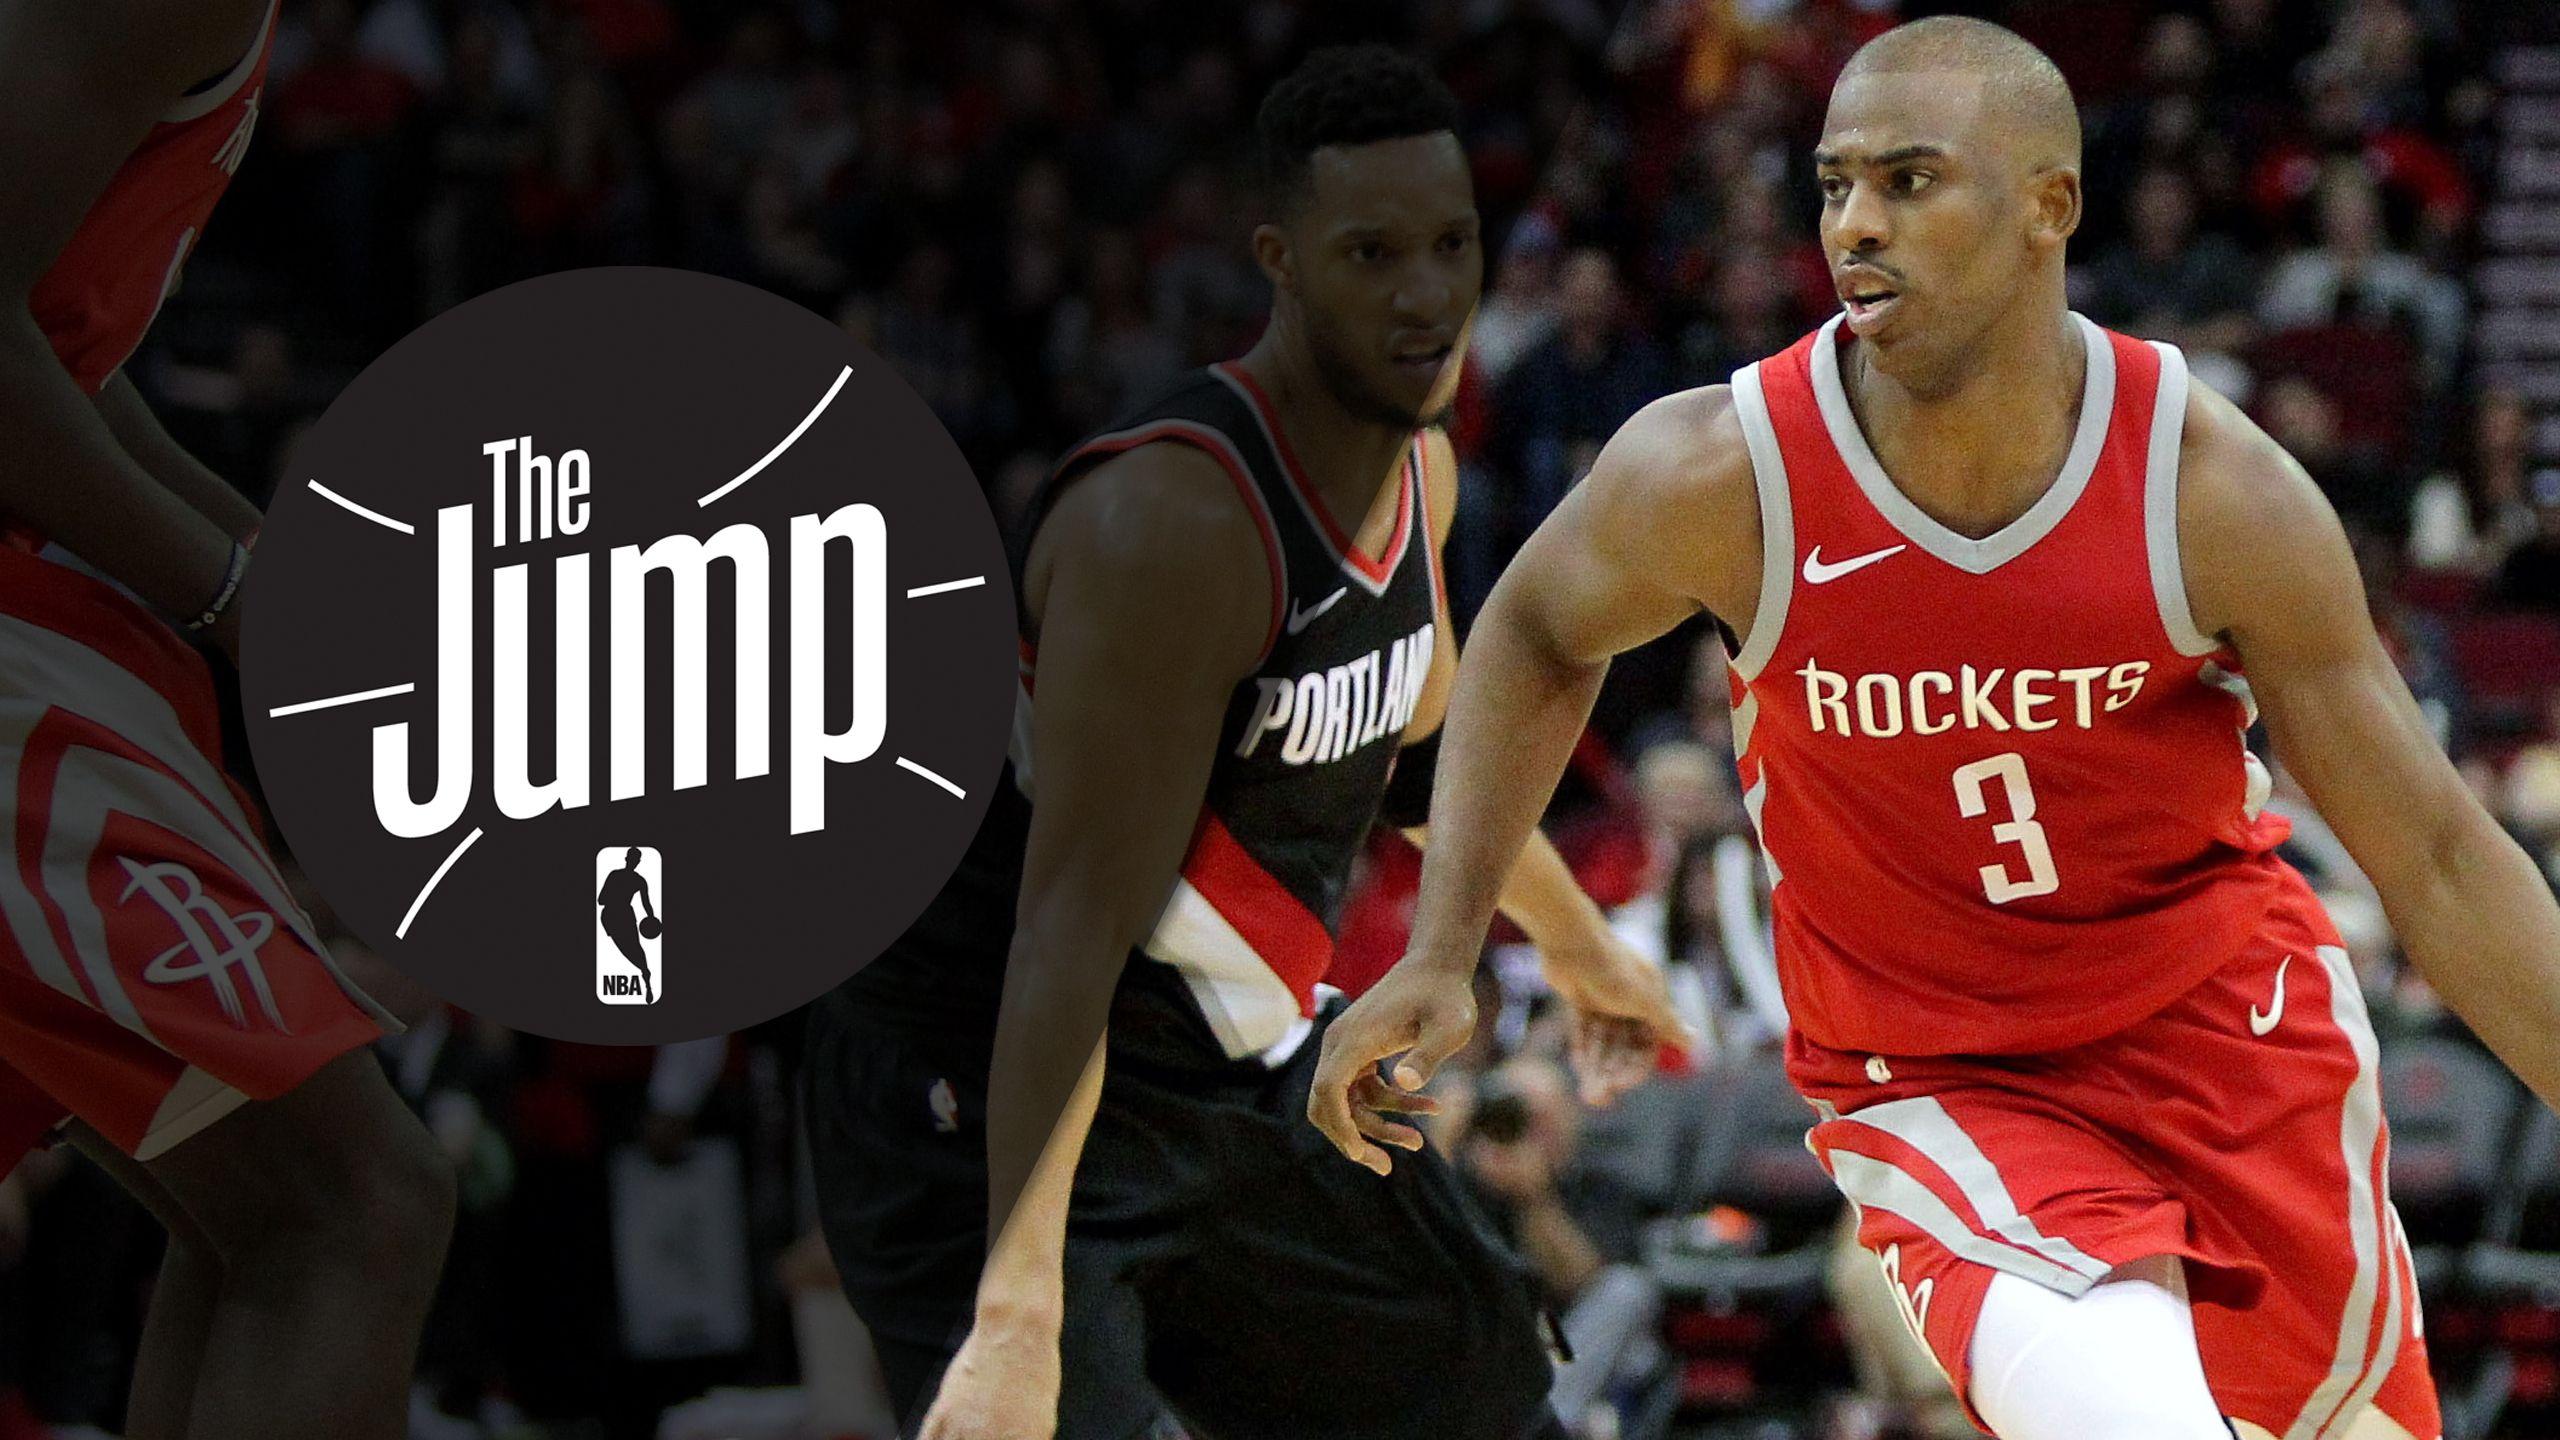 Mon, 1/15 - NBA: The Jump